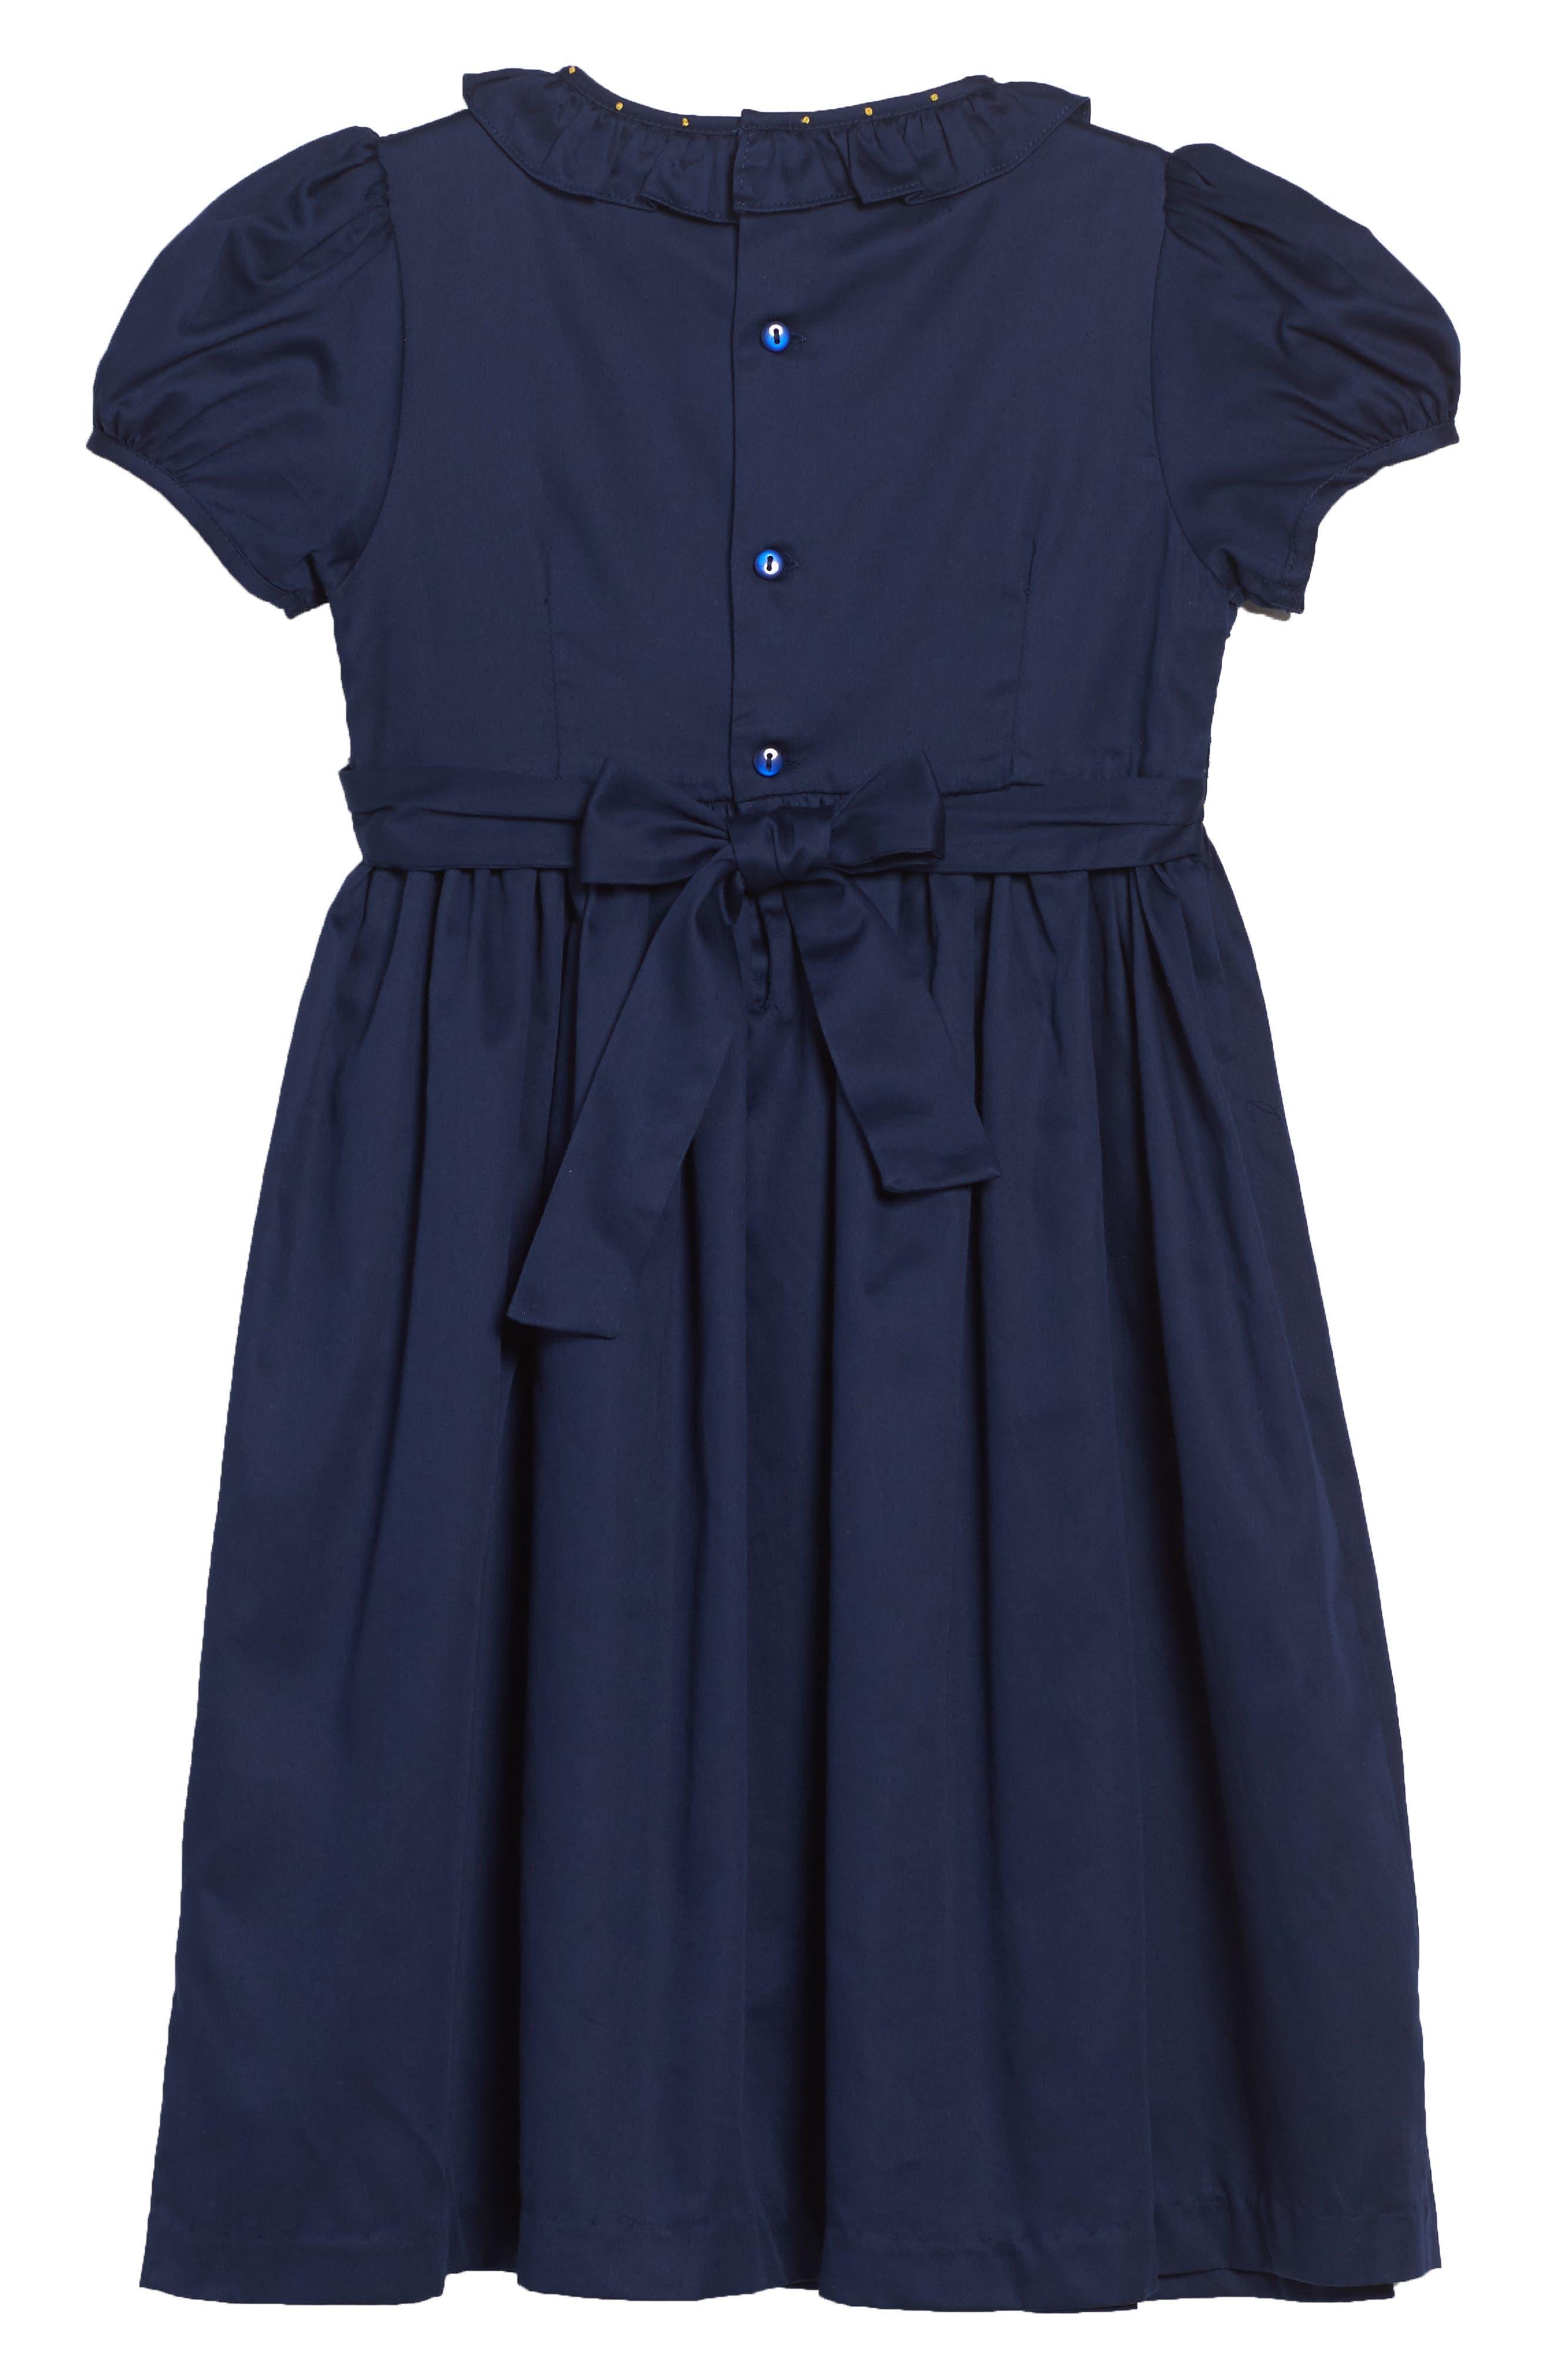 Smocked Dress,                             Alternate thumbnail 2, color,                             Navy/ Gold